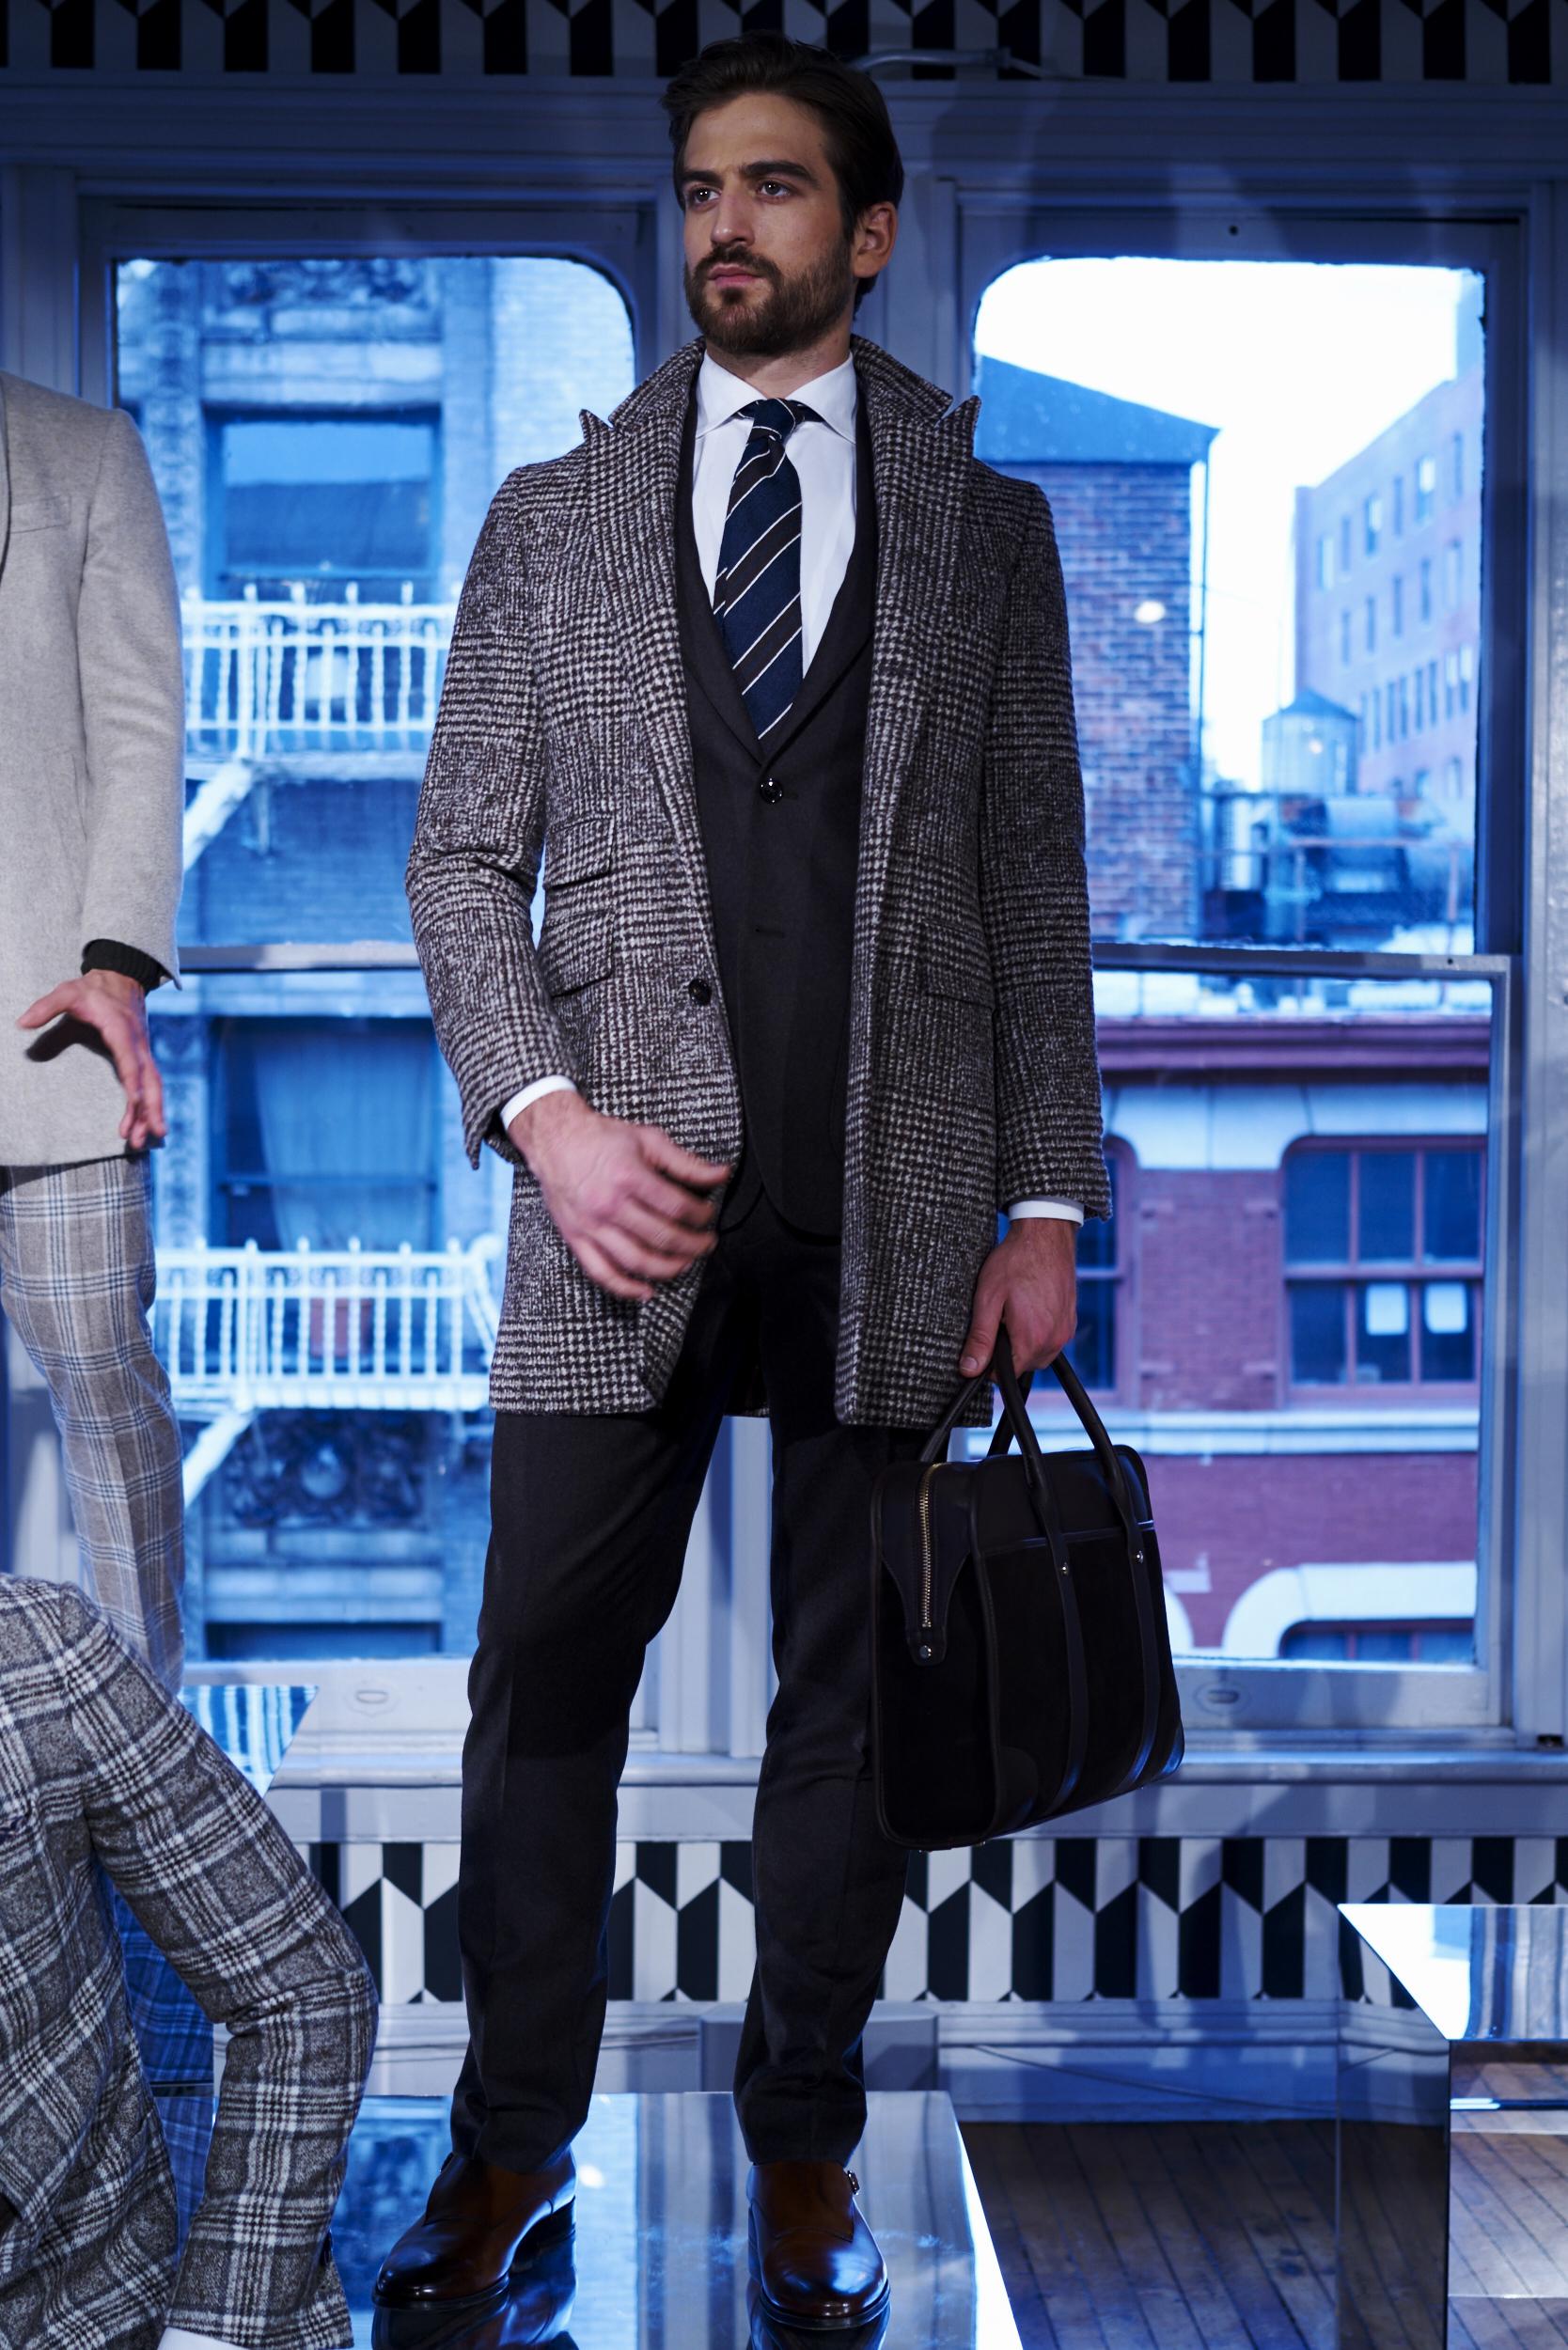 Suit_Supply_FW16_79.jpg